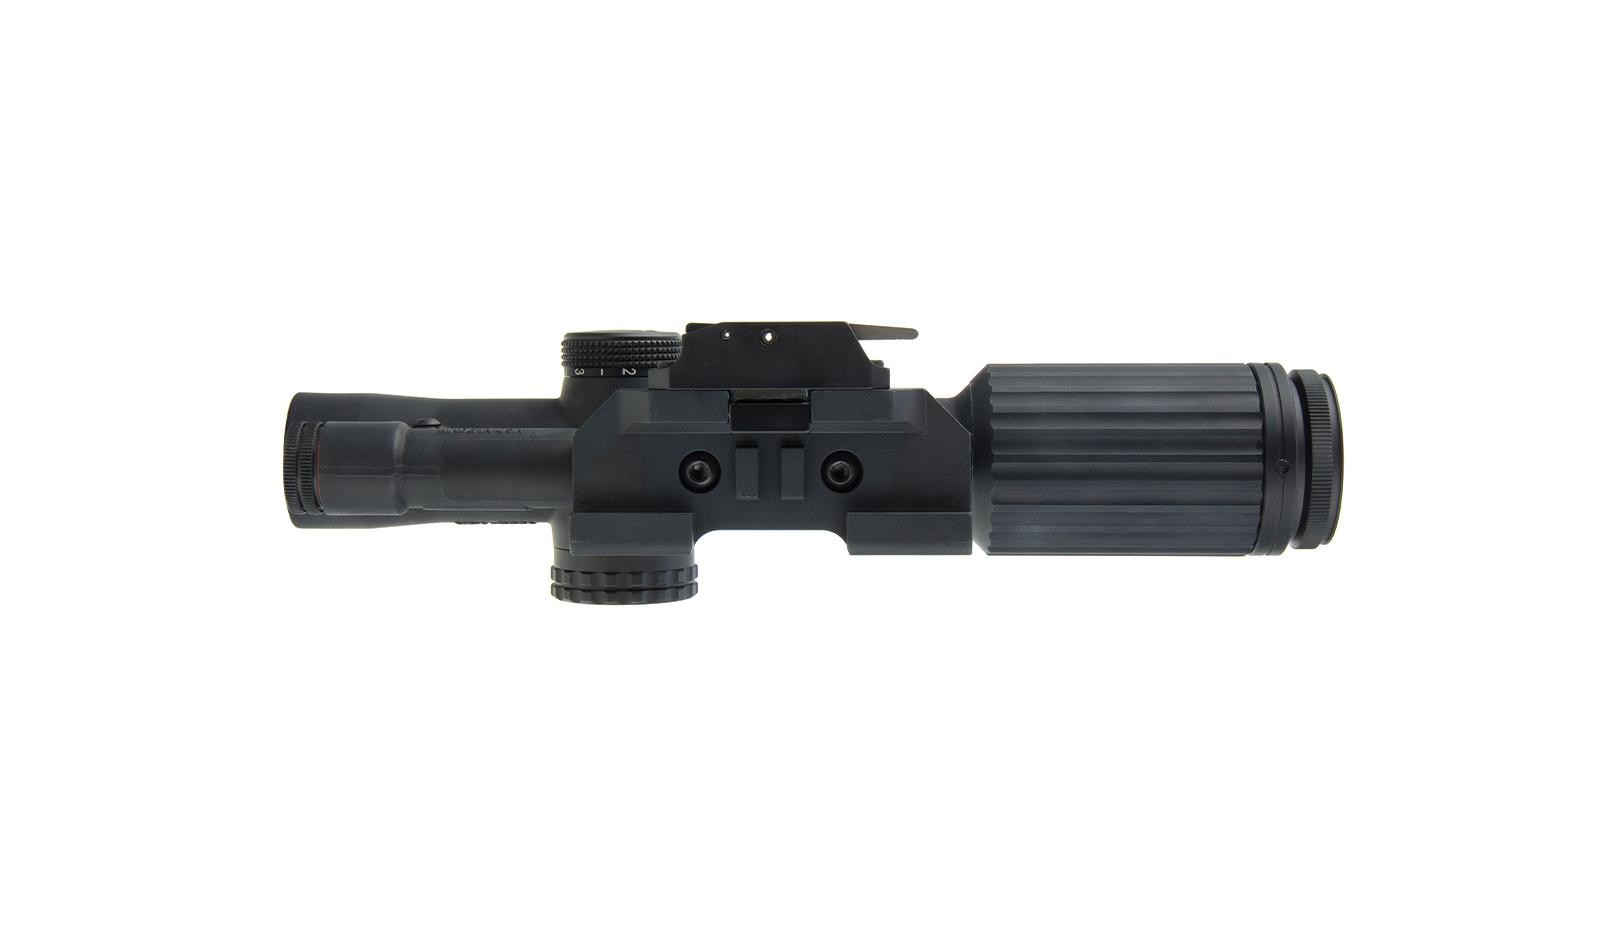 VC16-C-1600012 angle 10